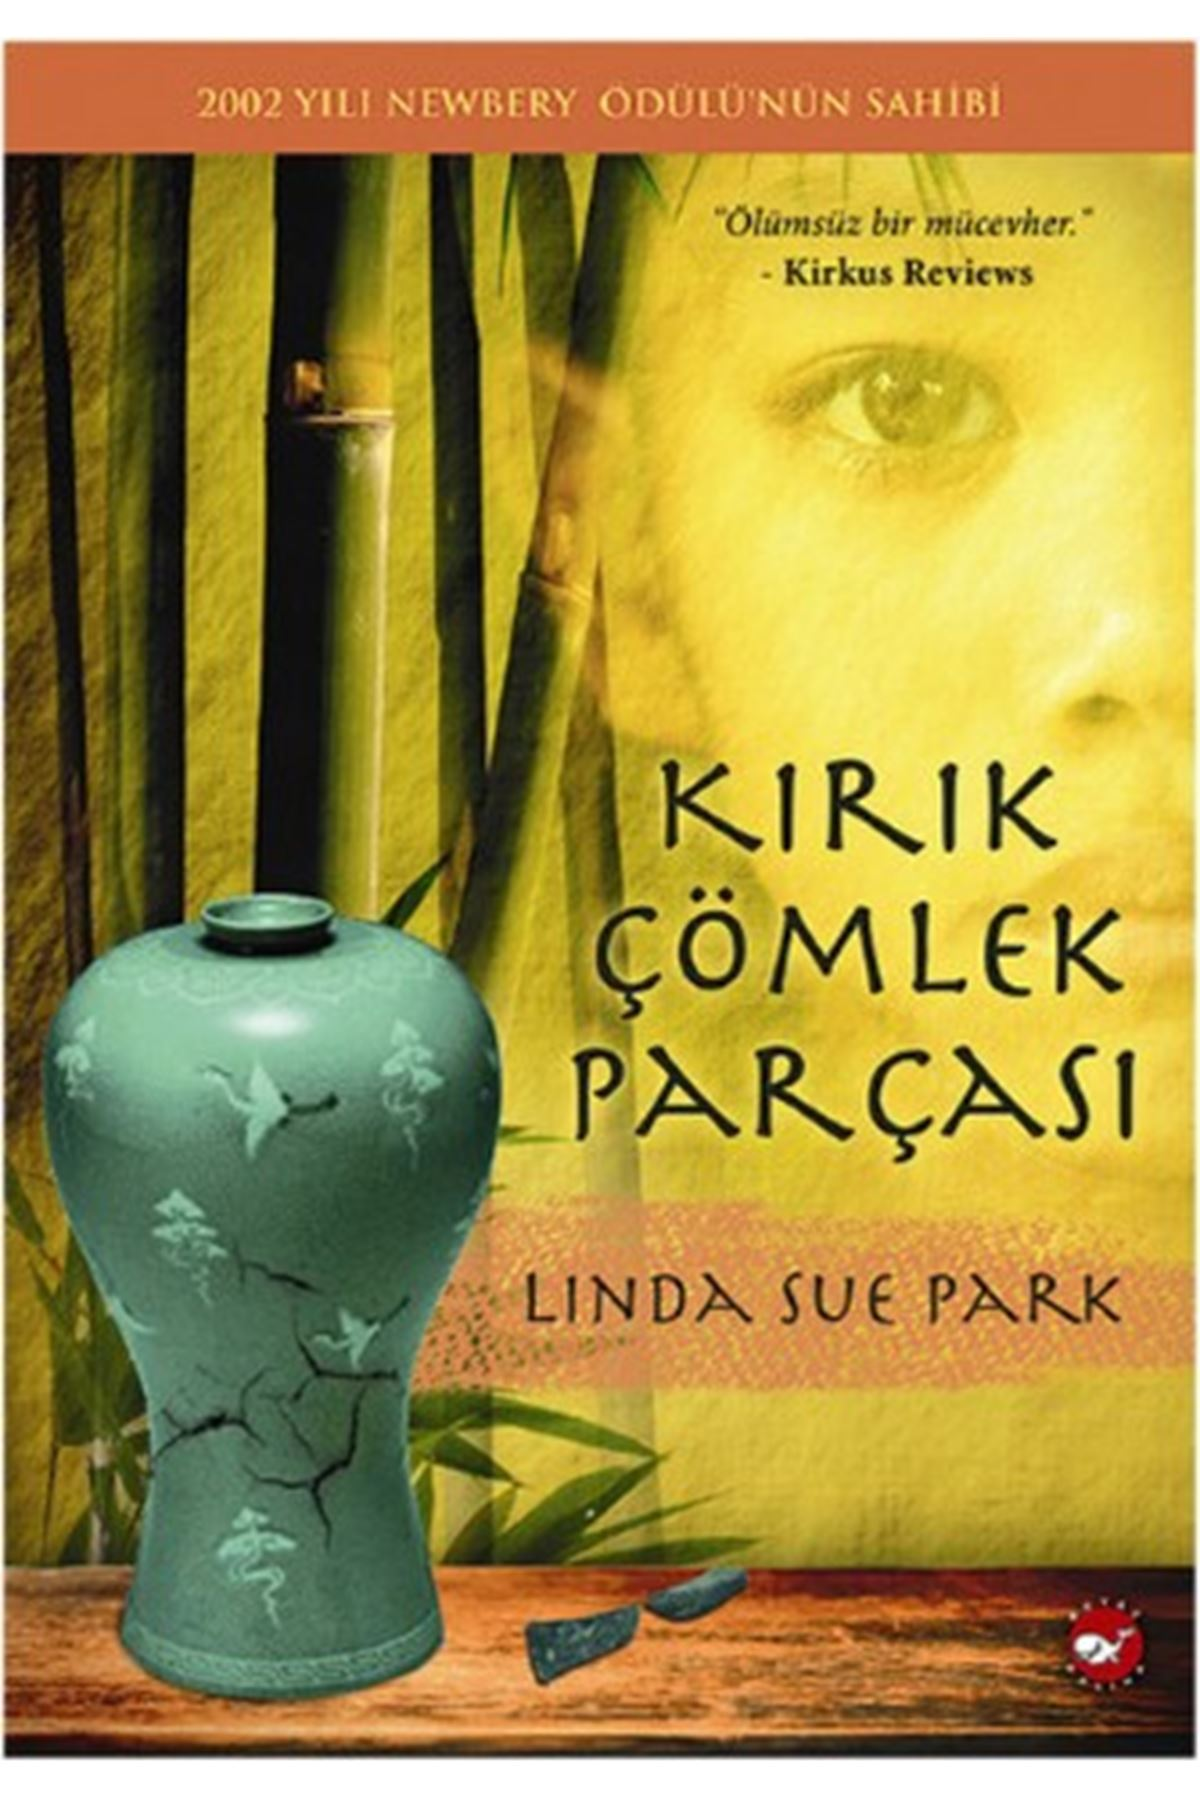 LİNDA SUE PARK - KIRIK ÇÖMLEK PARÇASI